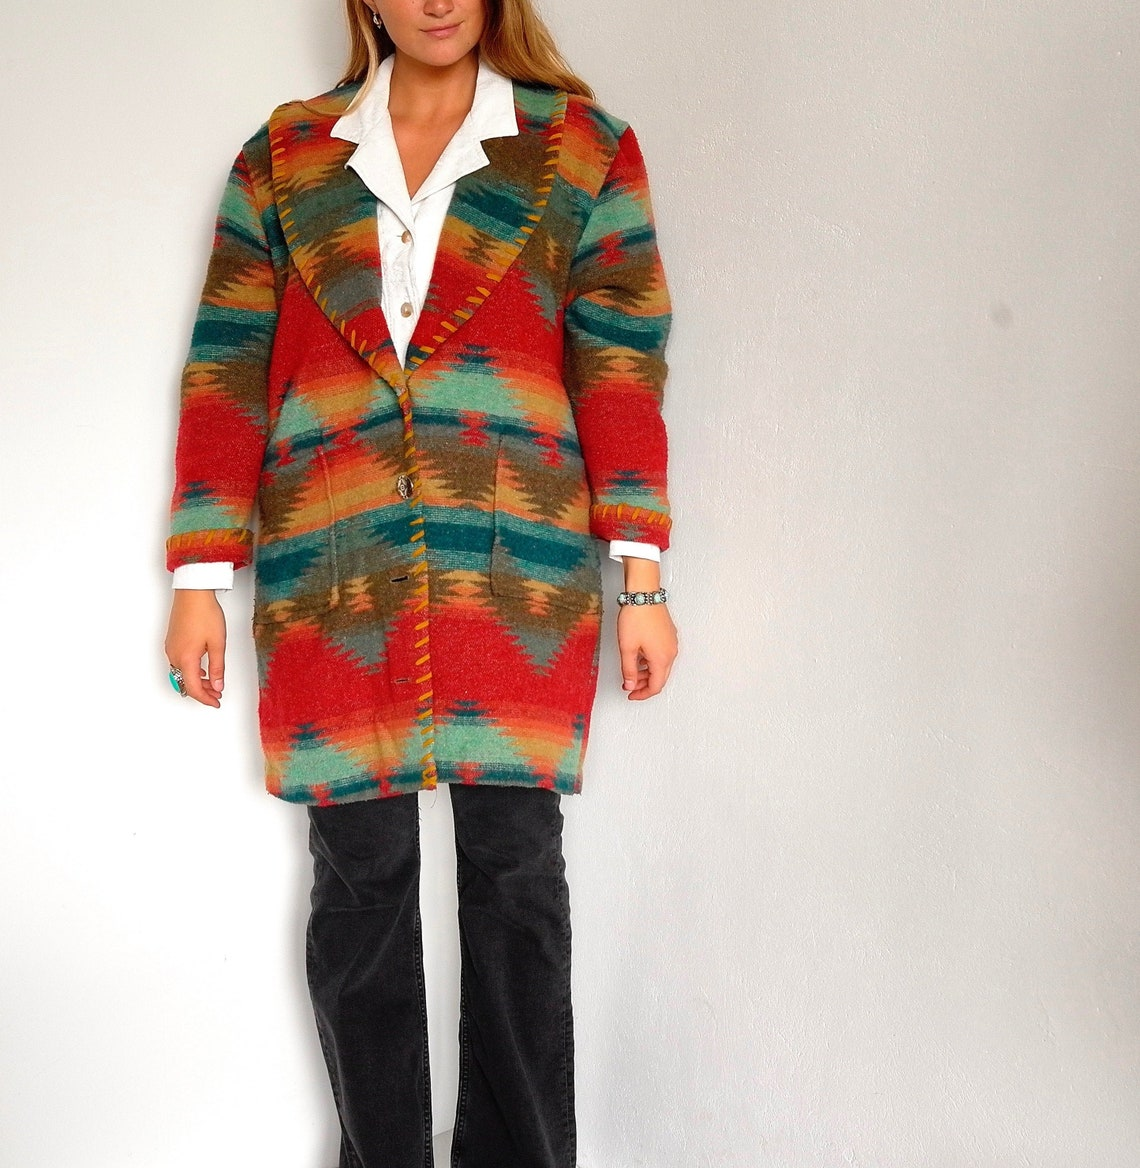 Vintage Aztec Southwestern Print Wool Blend 80s / 90s Warm Blanket Coat Red Turquoise Button Up Jacket Boho Bohemian Size Medium - Large